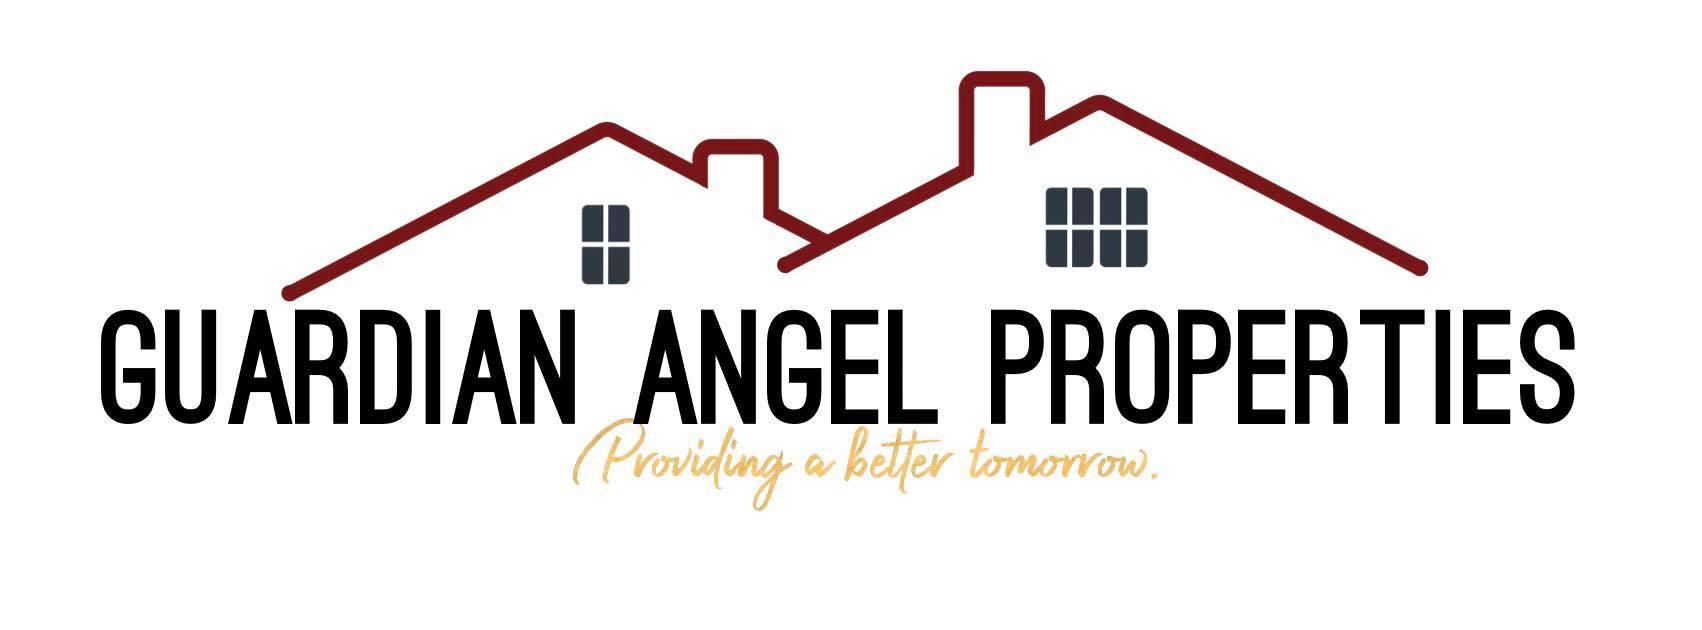 Guardian Angel Properties